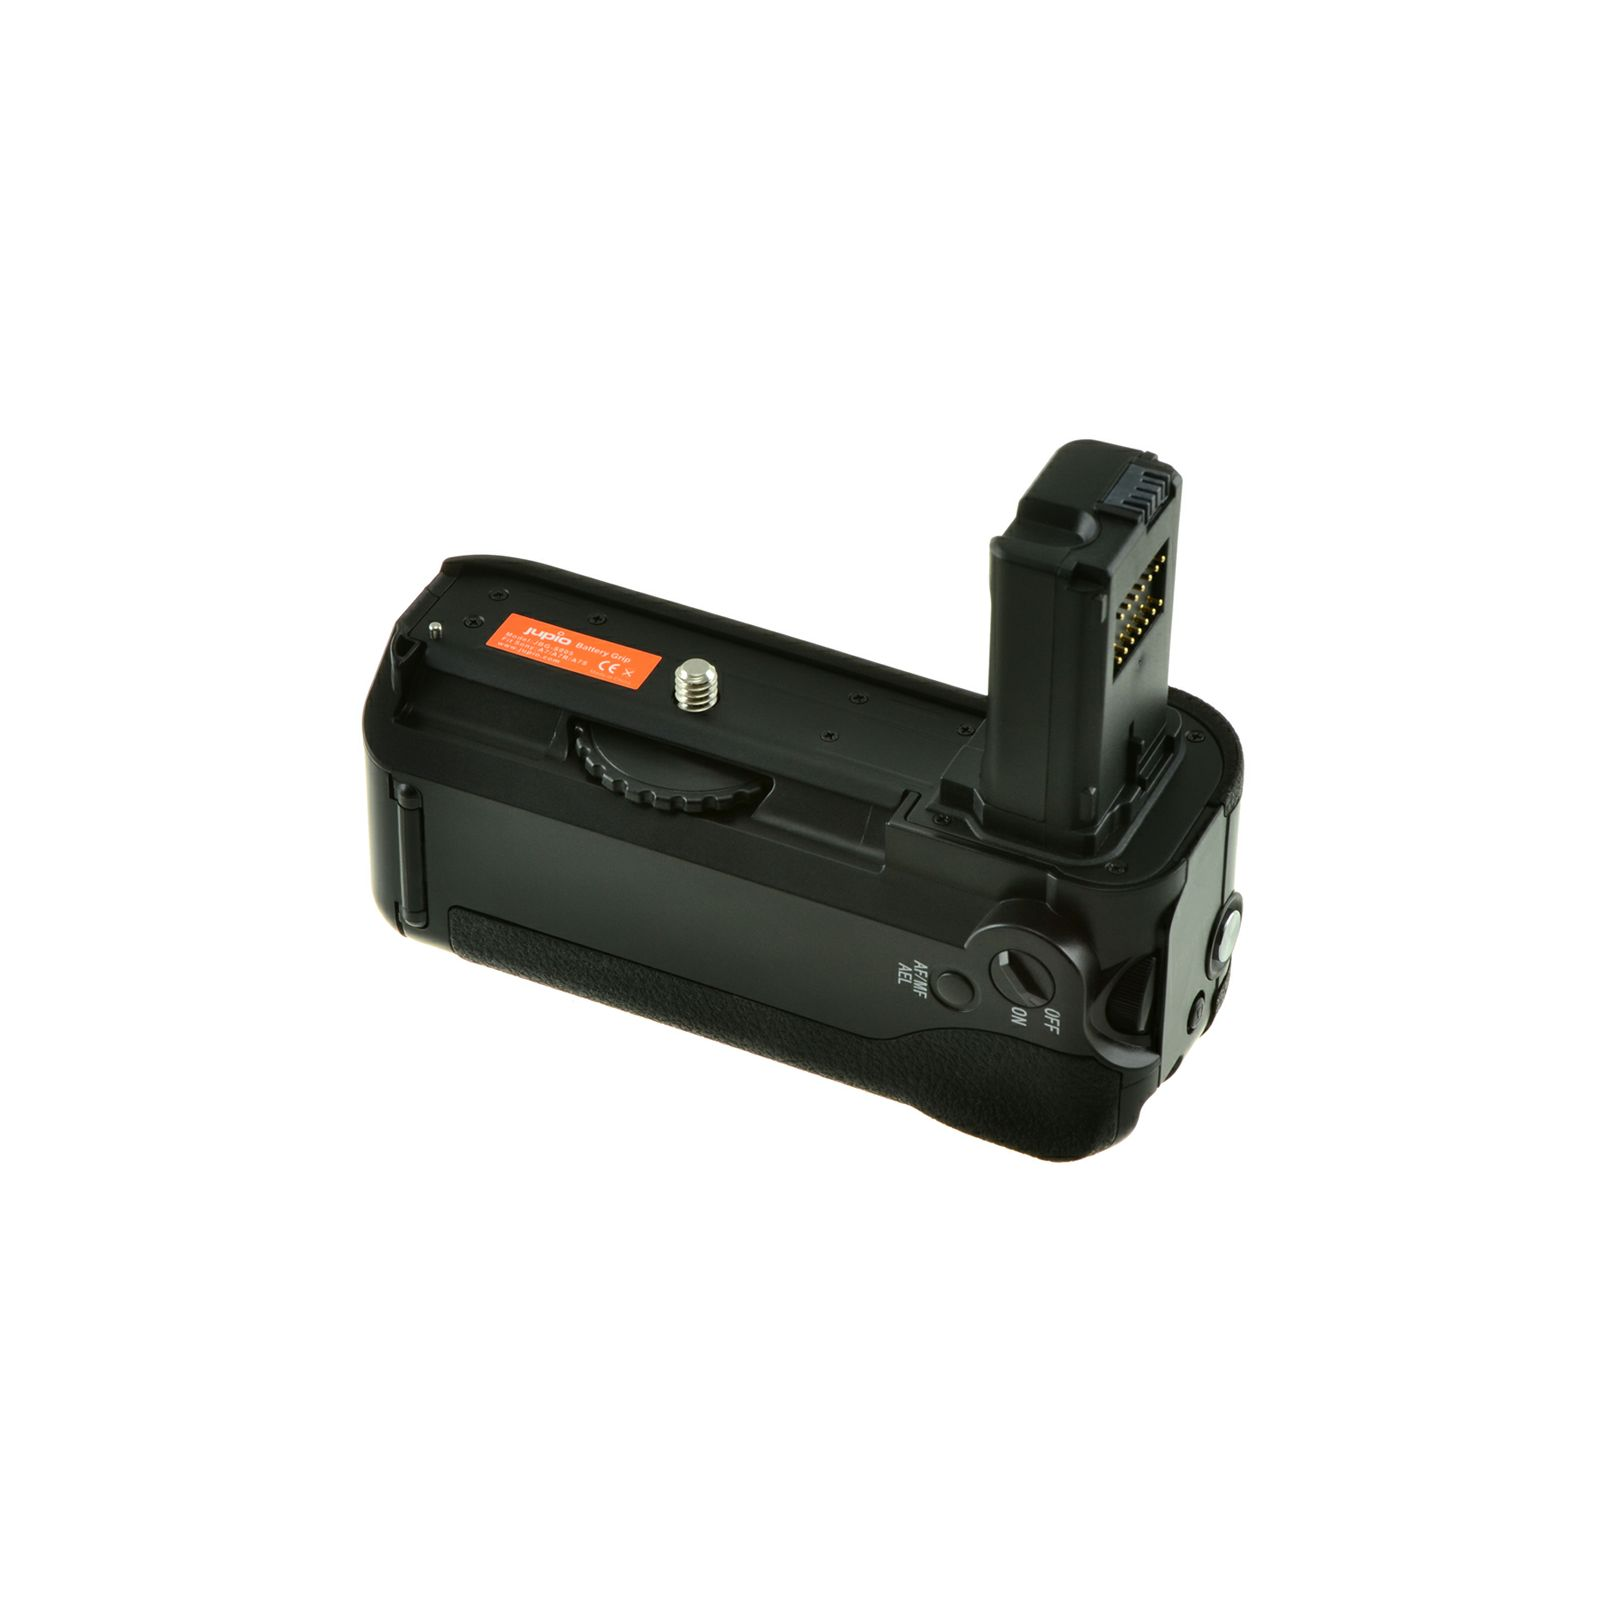 Jupio battery grip for Sony A7 II, A7R II, A7S II (VG-C2EM) no remote držač baterija (JBG-S006V2)